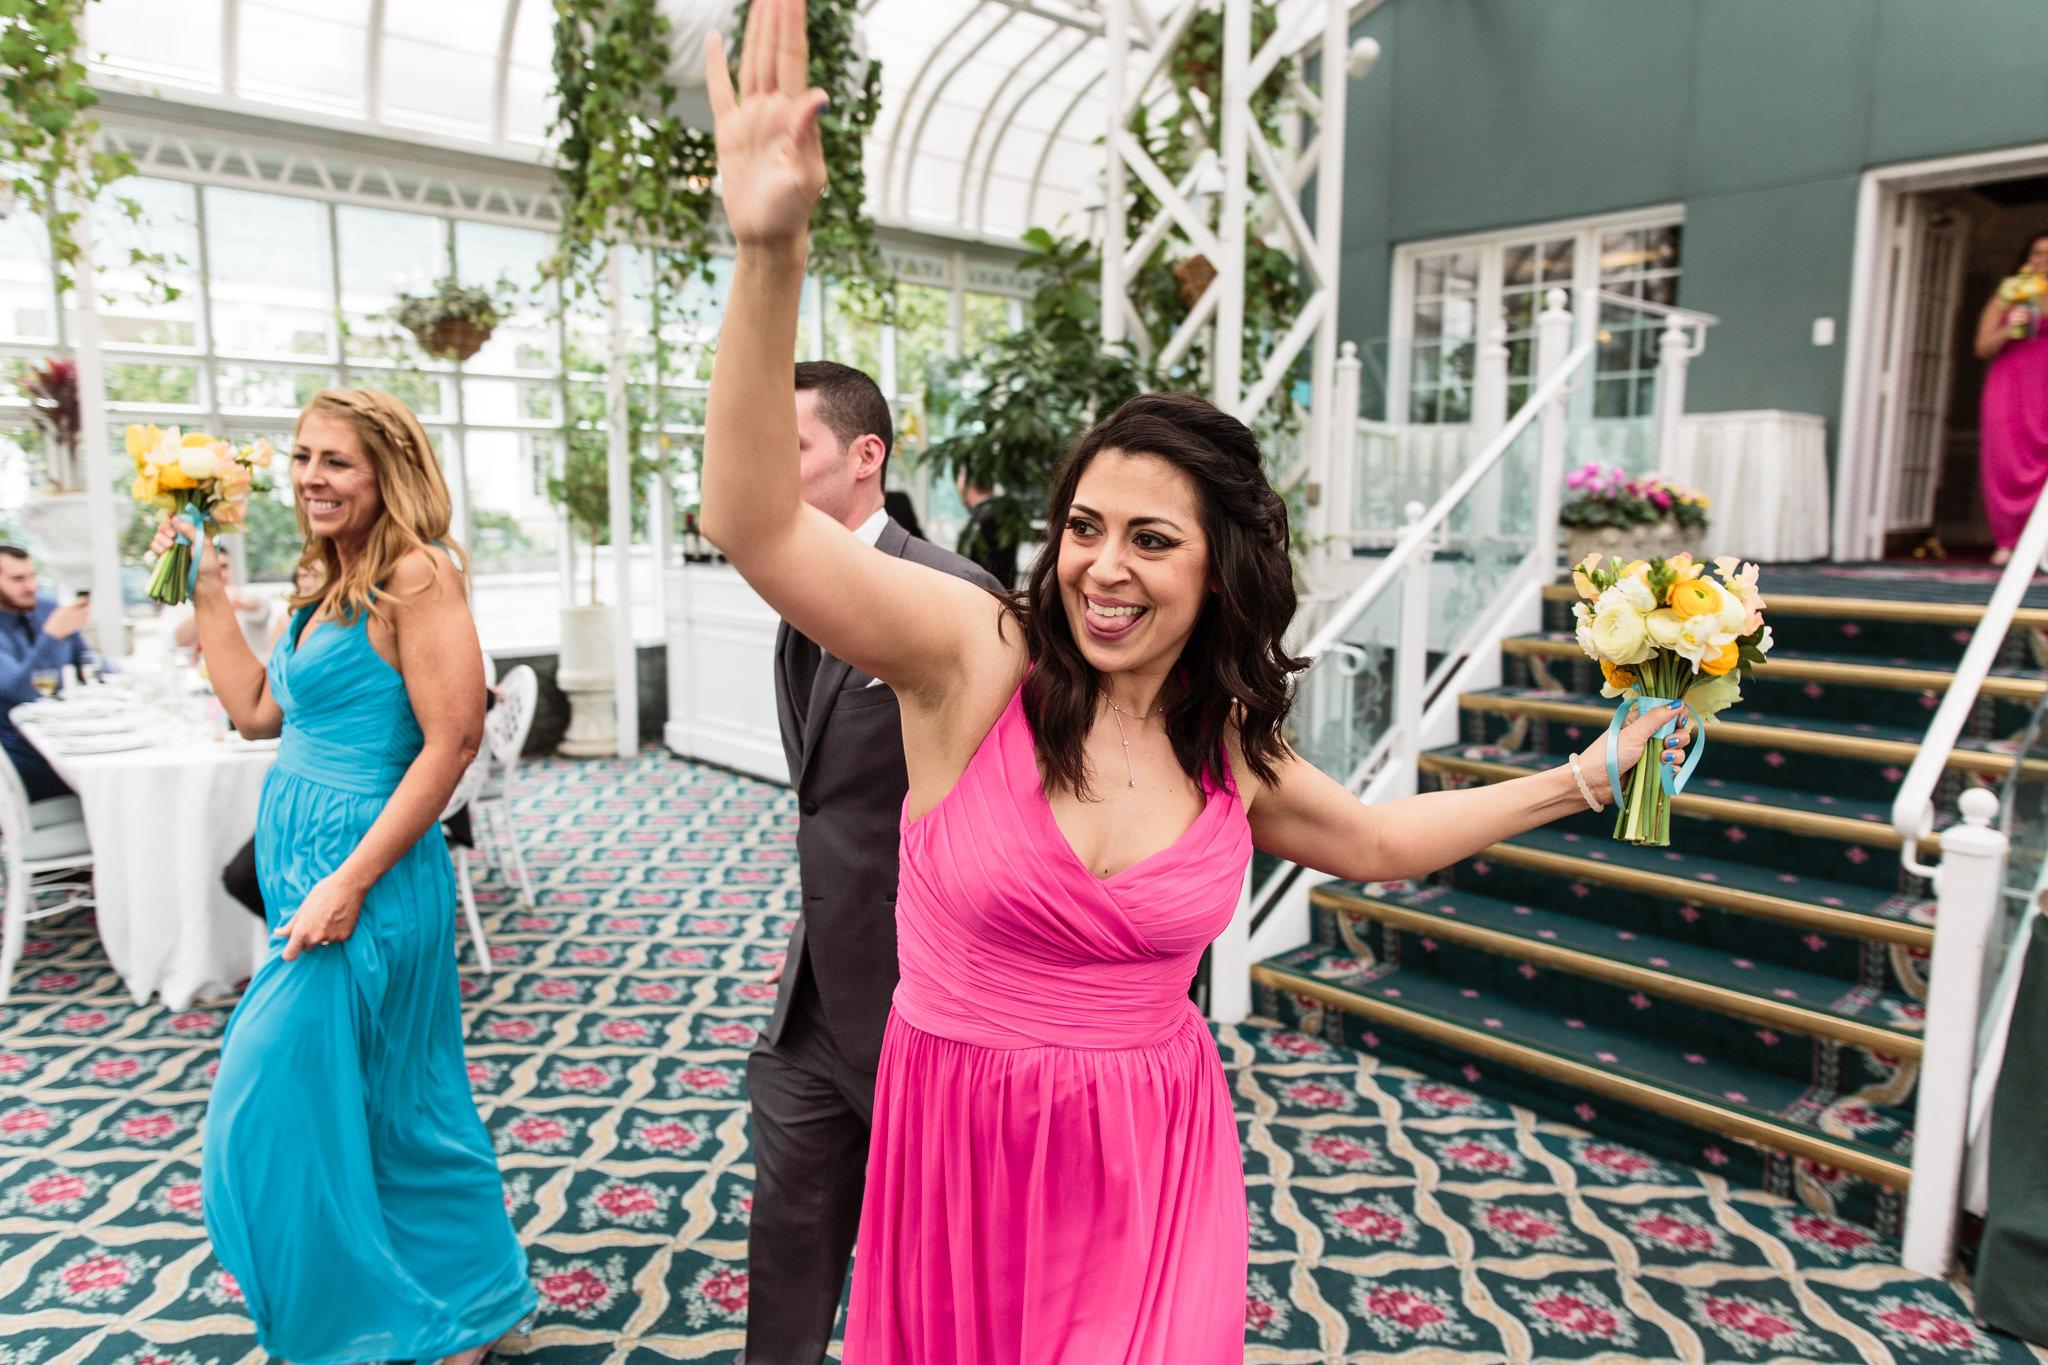 Hanchar_Madison_Hotel_NJ_Wedding_2C0A7983.jpg